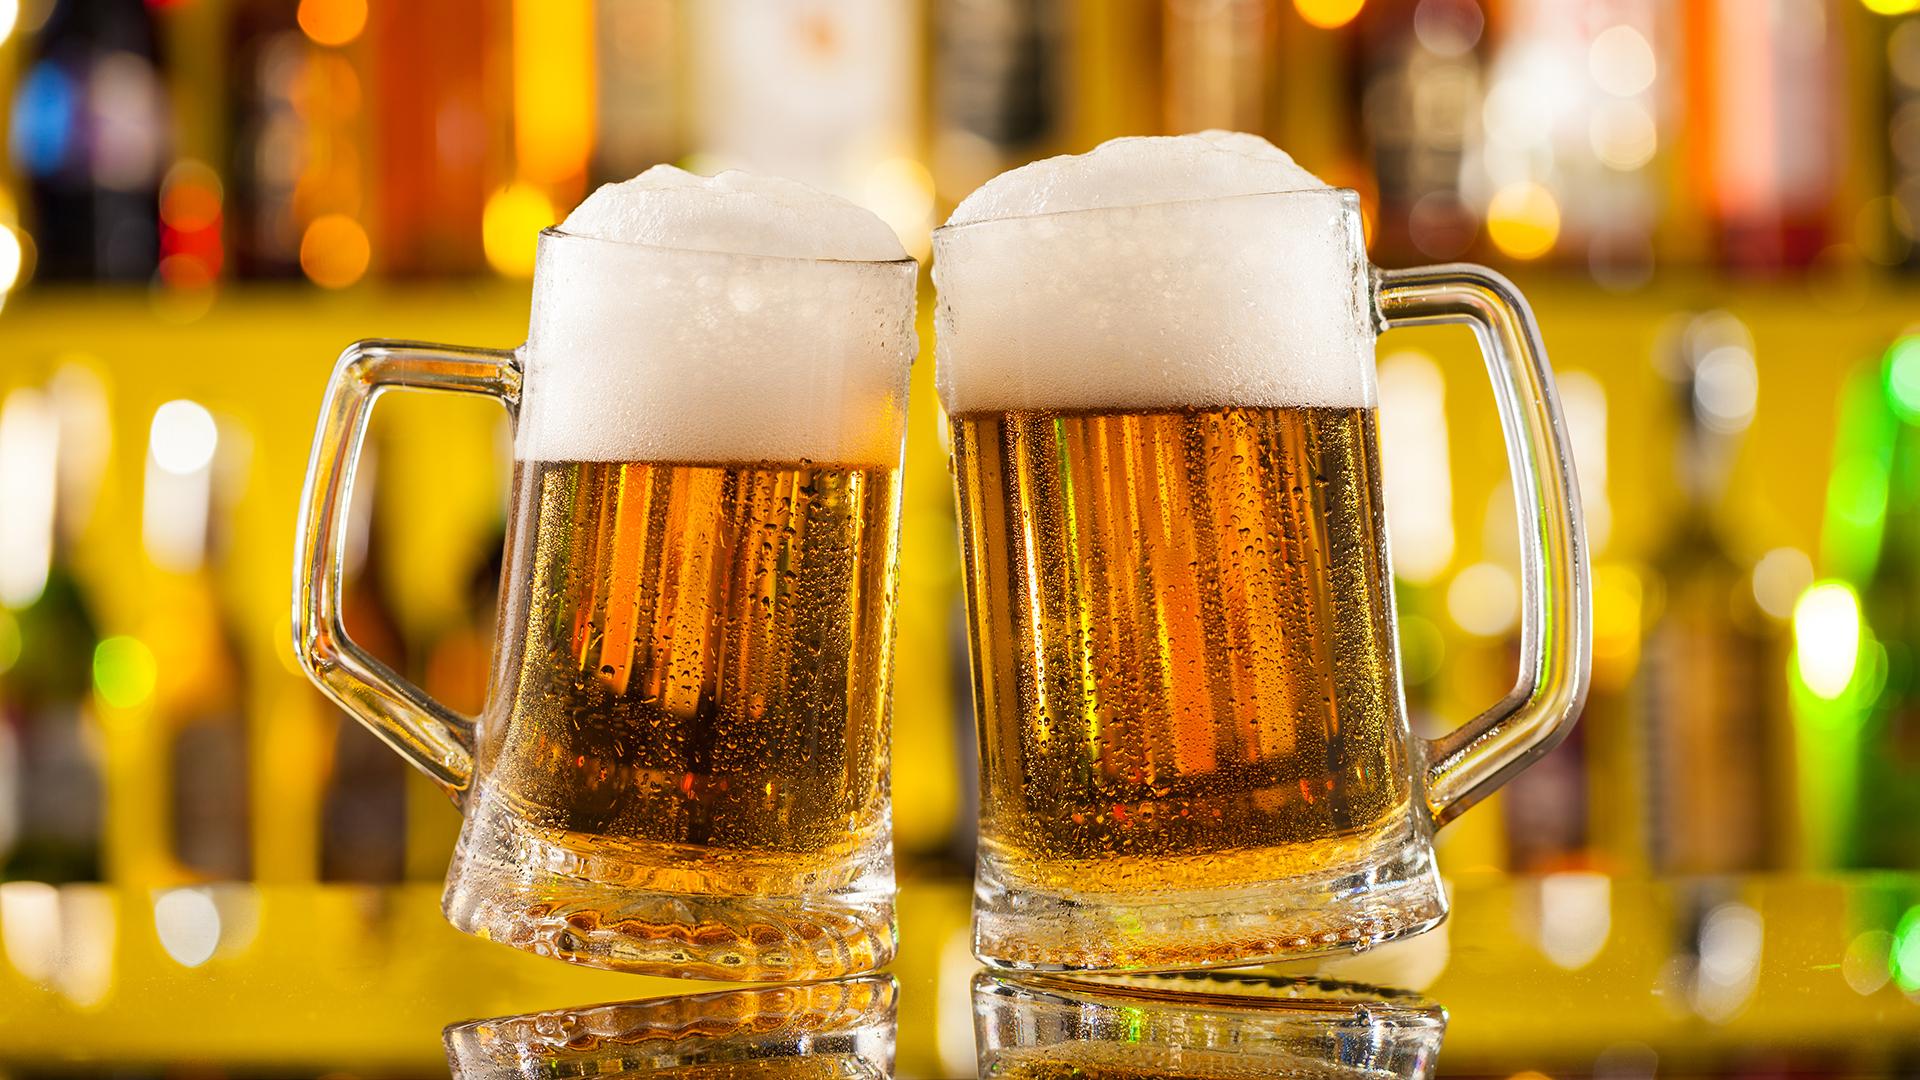 beber una cerveza al dia engorda